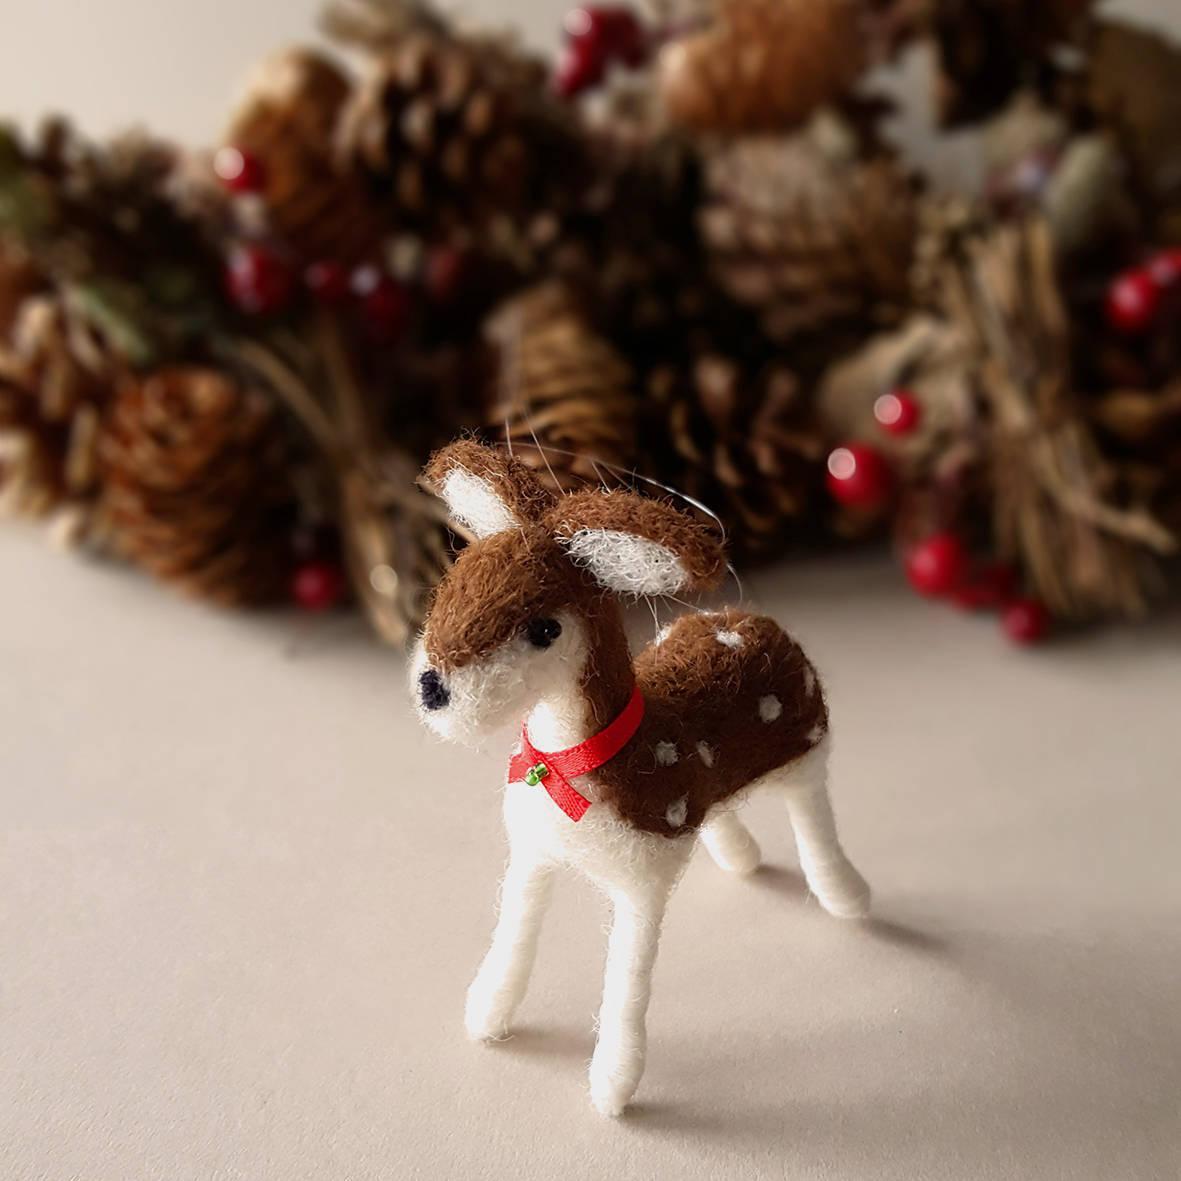 needle felted deer autumn decor, deer figurine farmhouse decor, woodland housewarming gift, woodland baby shower gift, brown and white deer